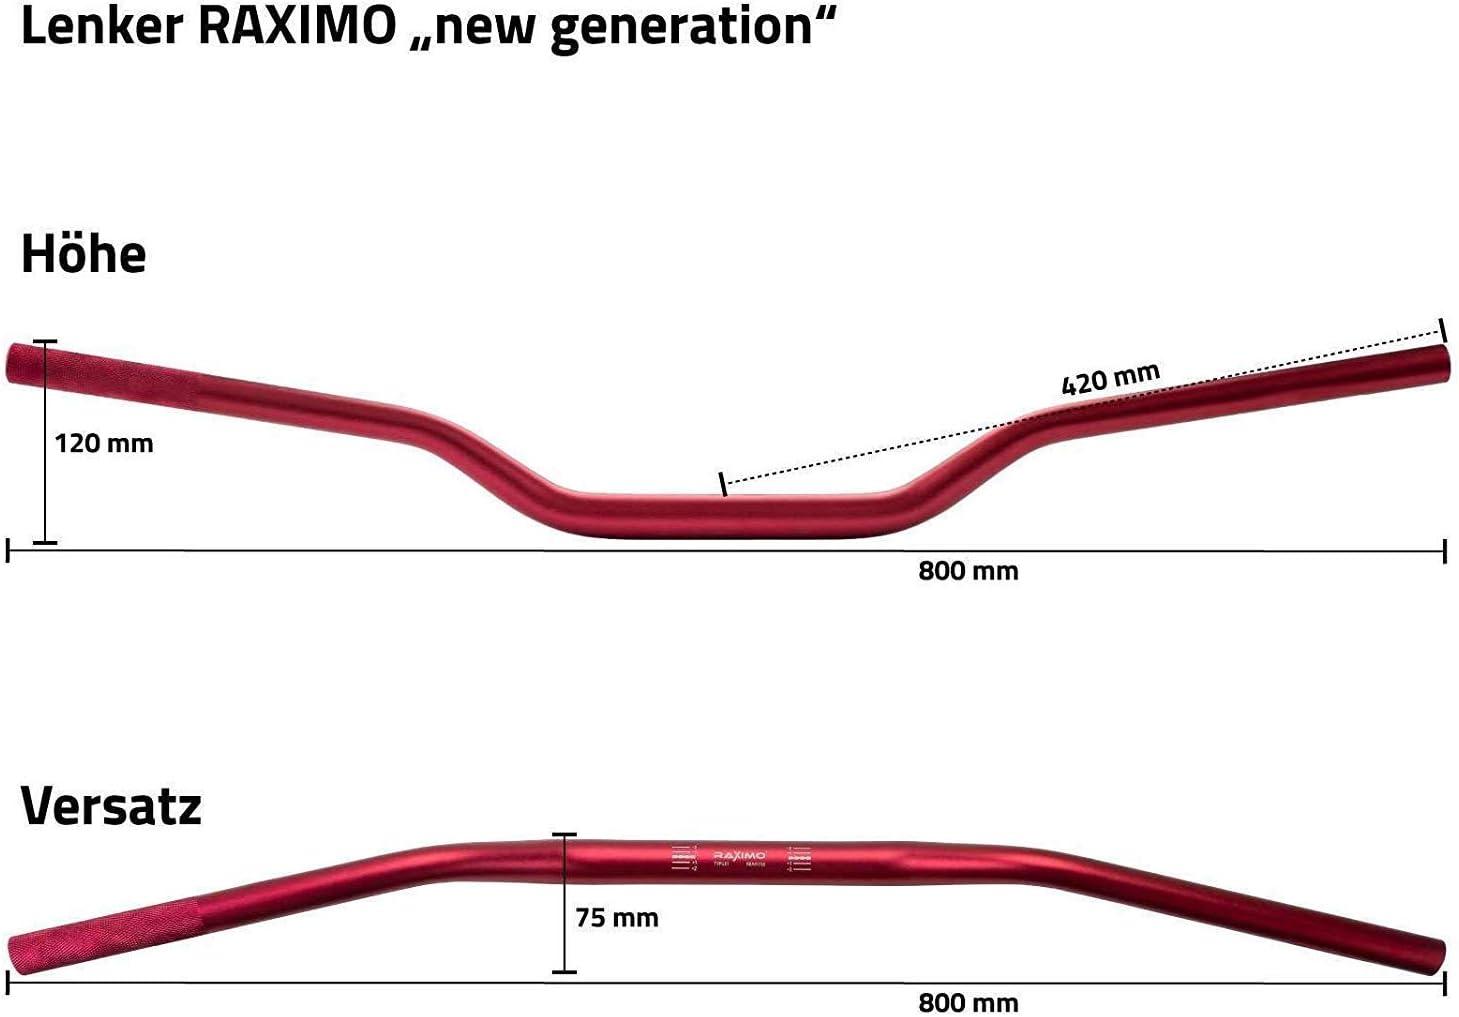 Alu Lenker New Generation 28mm konisch mit ABE Raximo schwarz